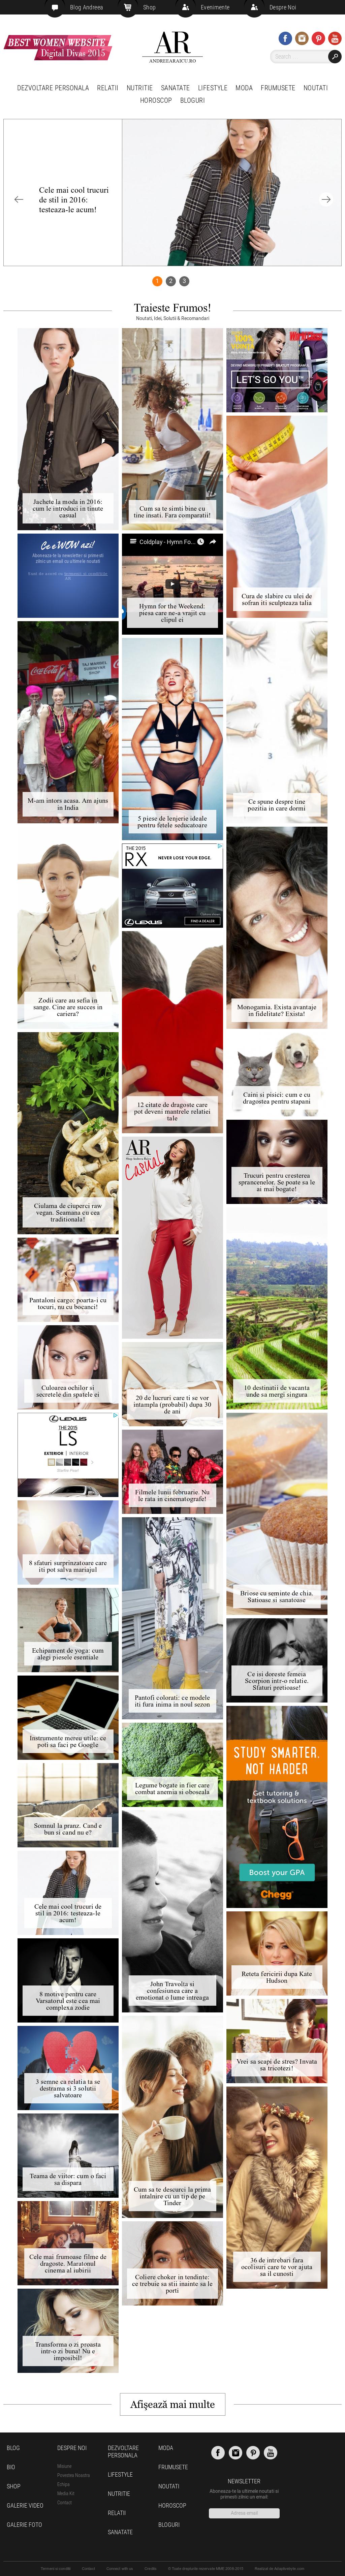 Ar The Stylish Network Revista Andreea Raicu Competitors Revenue